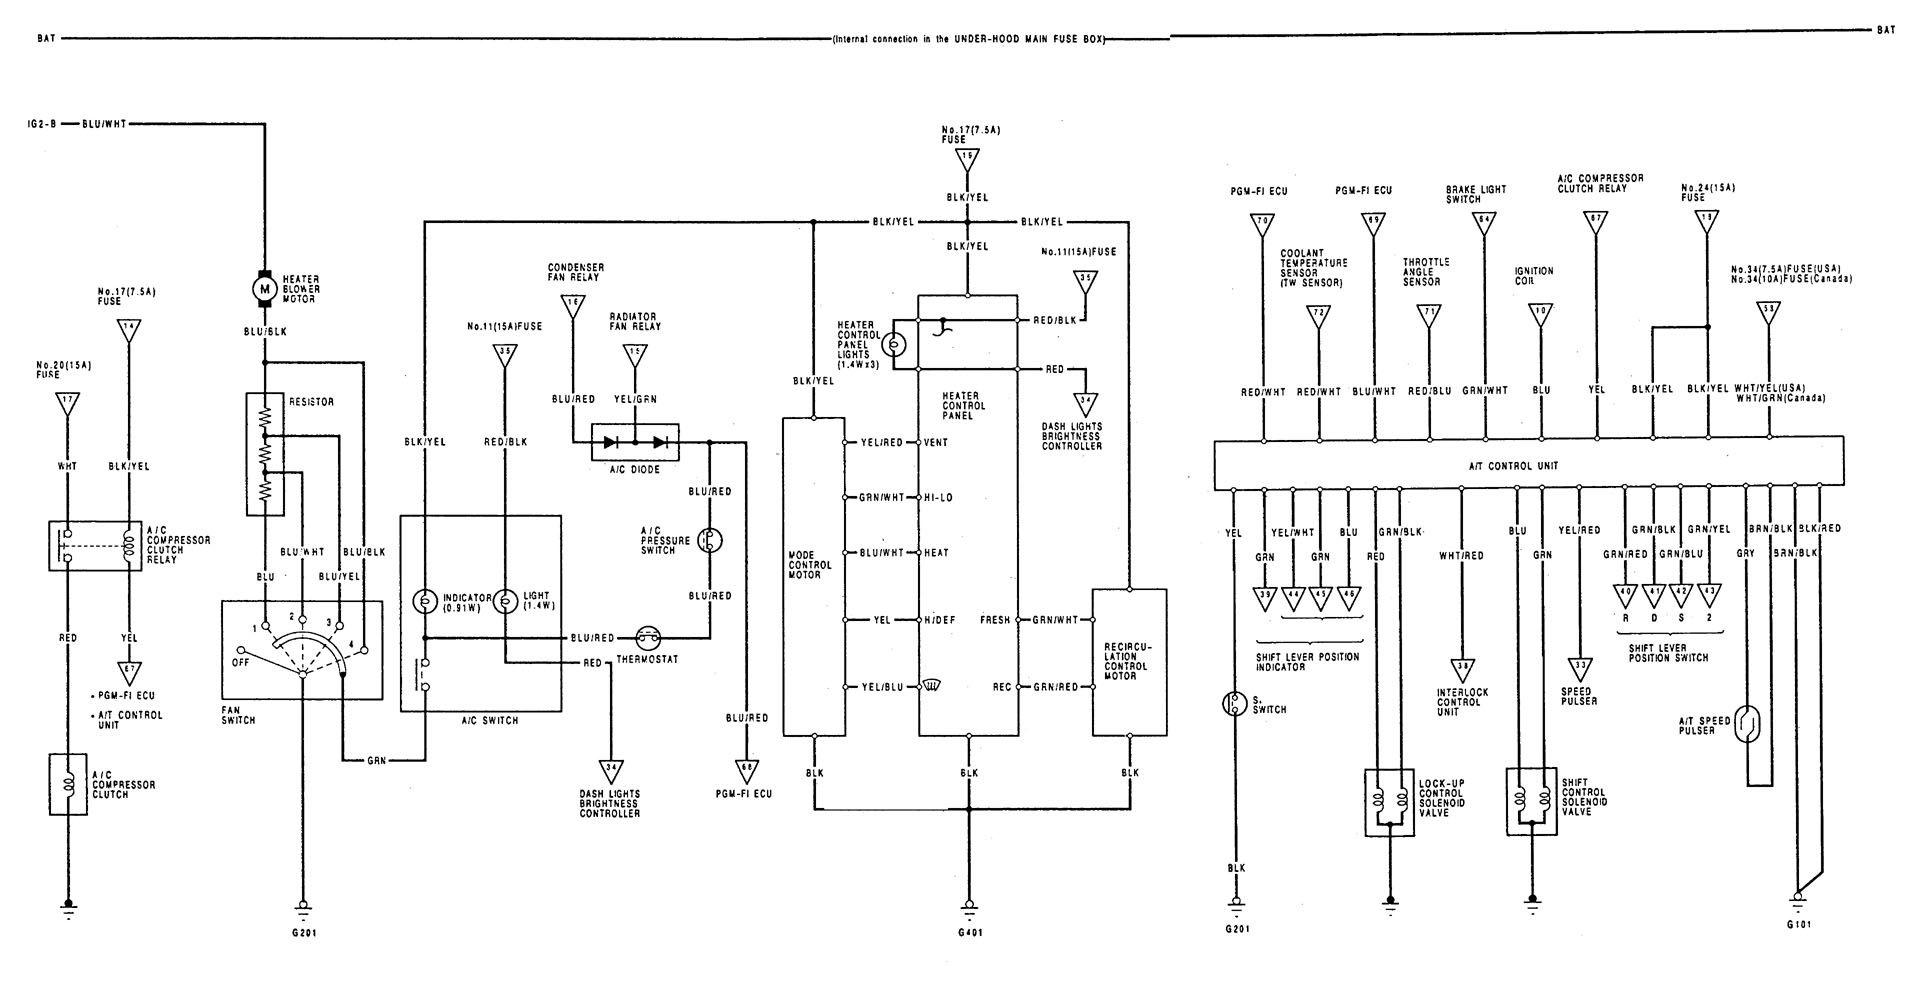 1992 Acura Integra Headlight Wiring Diagram All Kind Of 1990 Fuse Box 1993 Diagrams Hvac Control Carknowledge Heater Gsr Head